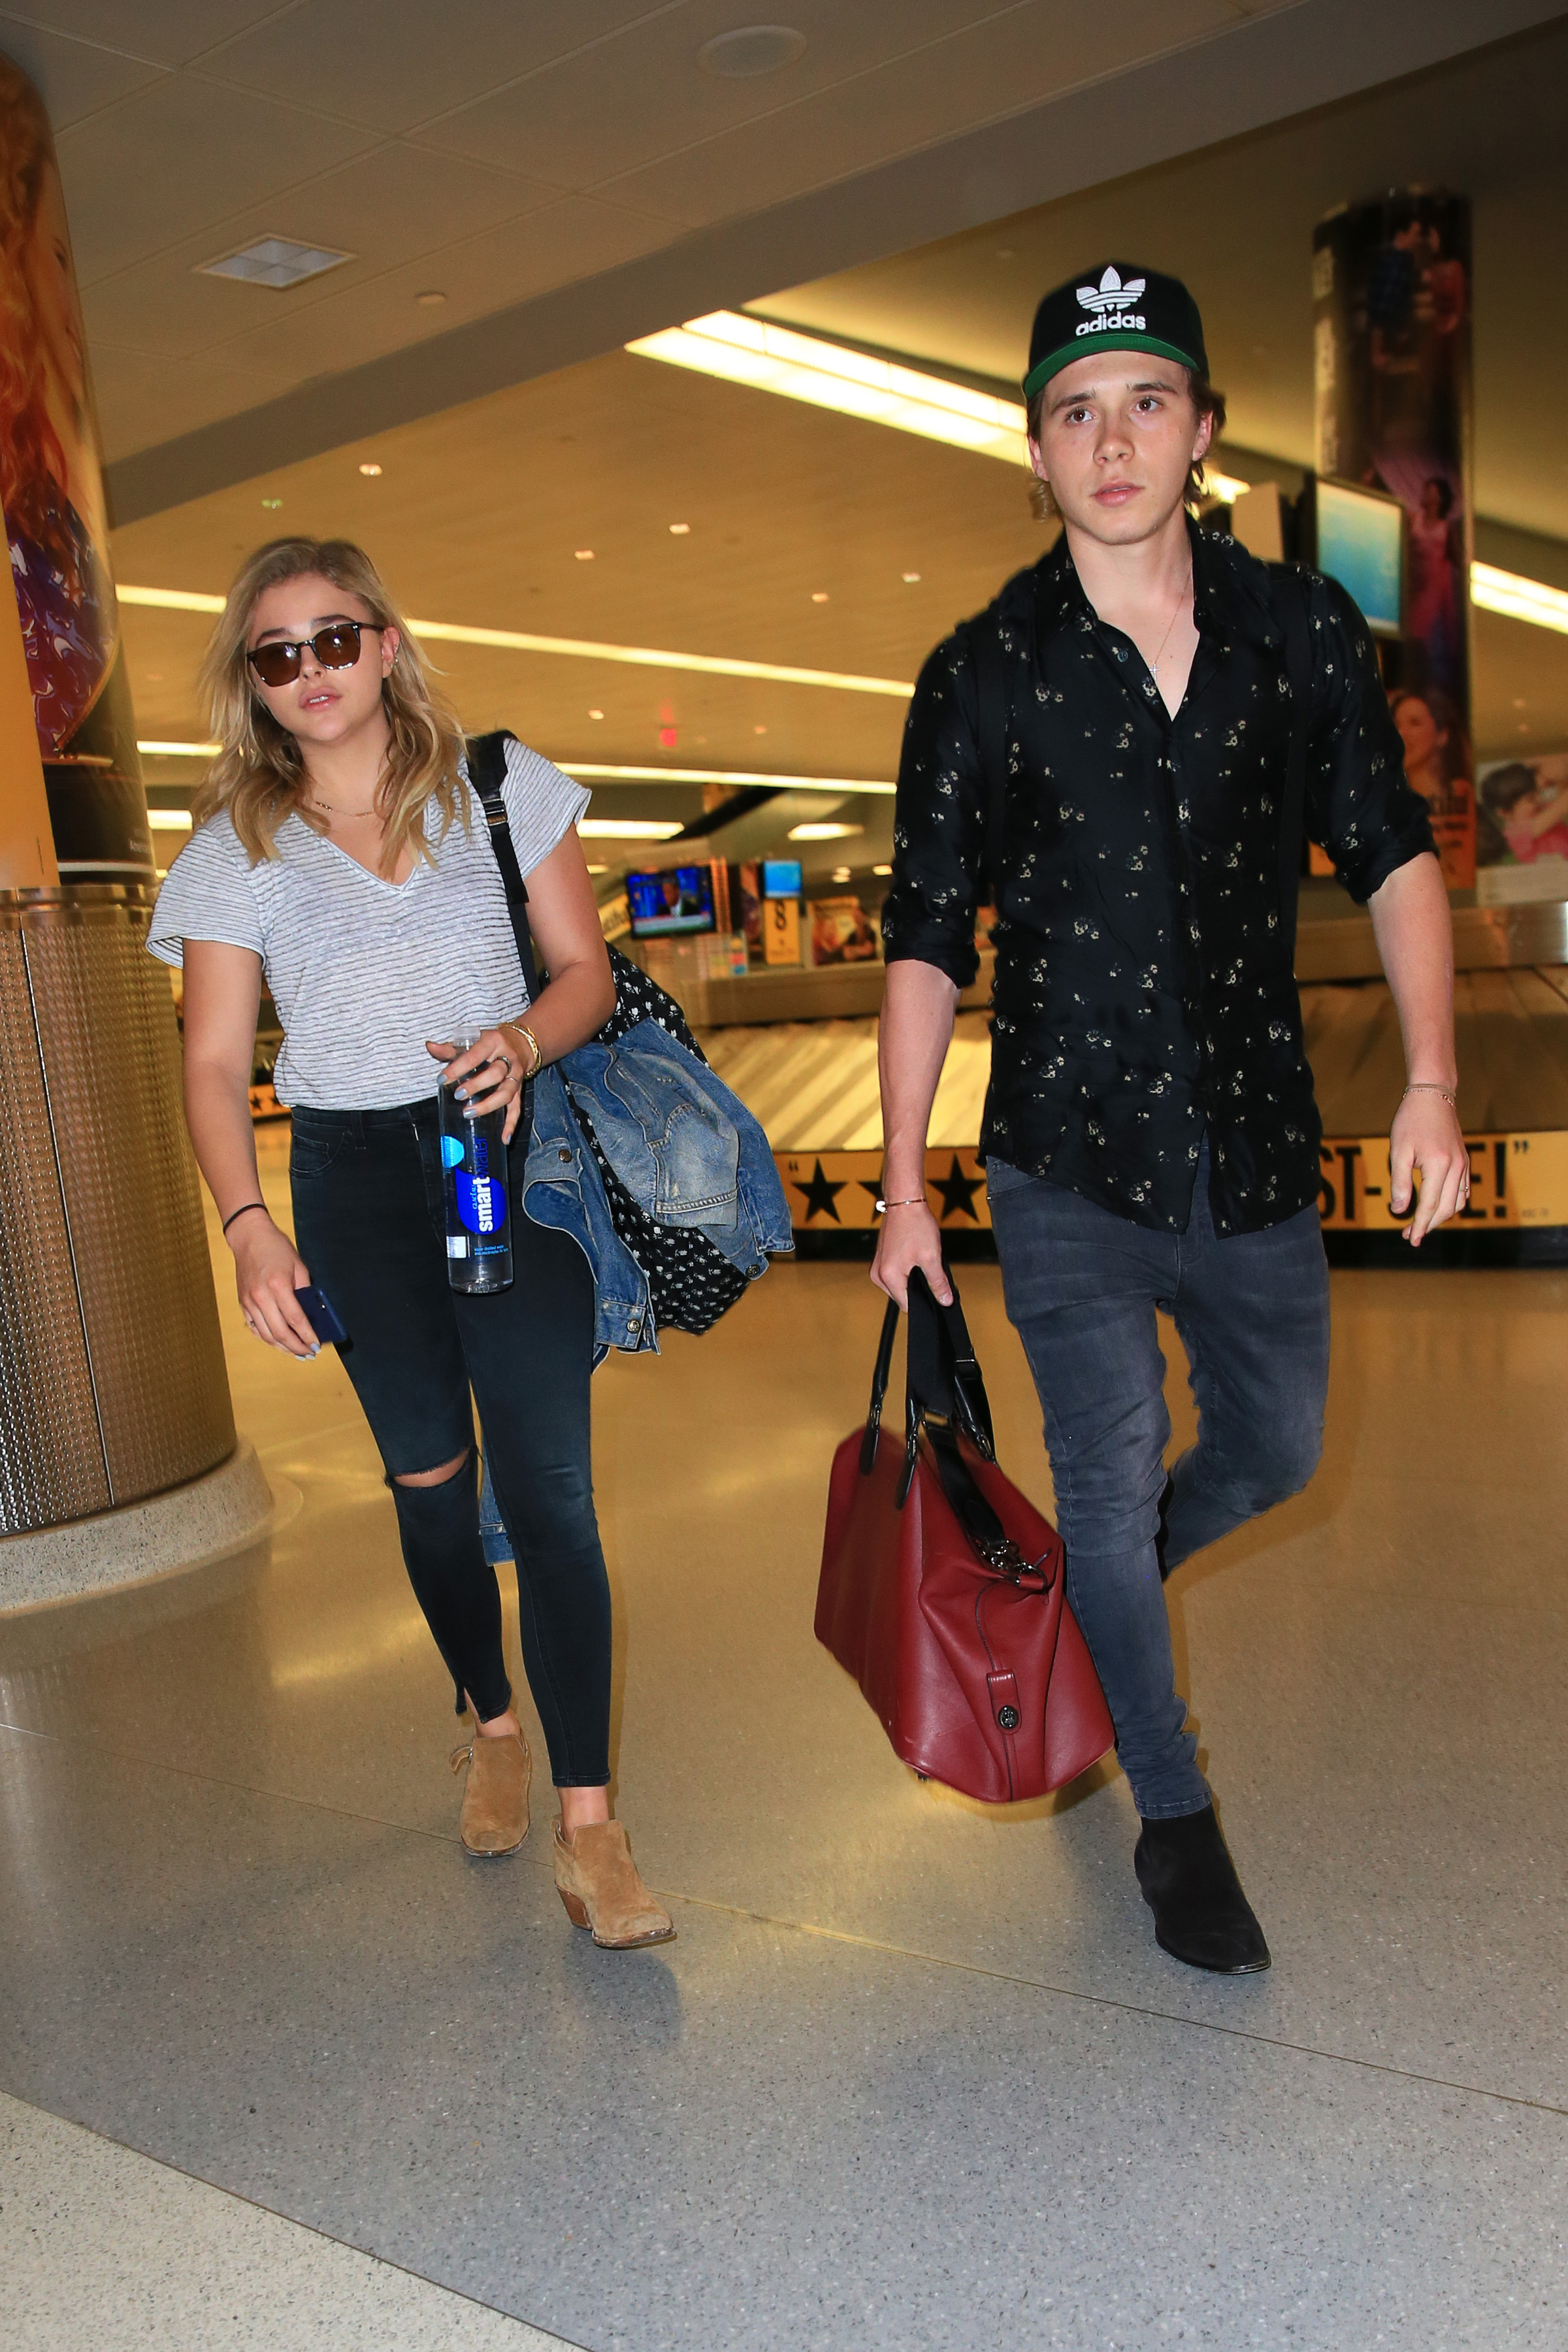 June 27, 2016: Chloe Moretz and her boyfriend Brooklyn Beckham are photographed tonight arriving at JFK International Airport in New York city <P> Pictured: Chloe Moretz, Brooklyn Beckham <B>Ref: SPL1612831  301017  </B><BR/> Picture by: Elder Ordonez / Splash News<BR/> </P><P> <B>Splash News and Pictures</B><BR/> Los Angeles:310-821-2666<BR/> New York:212-619-2666<BR/> London:870-934-2666<BR/> <span id=